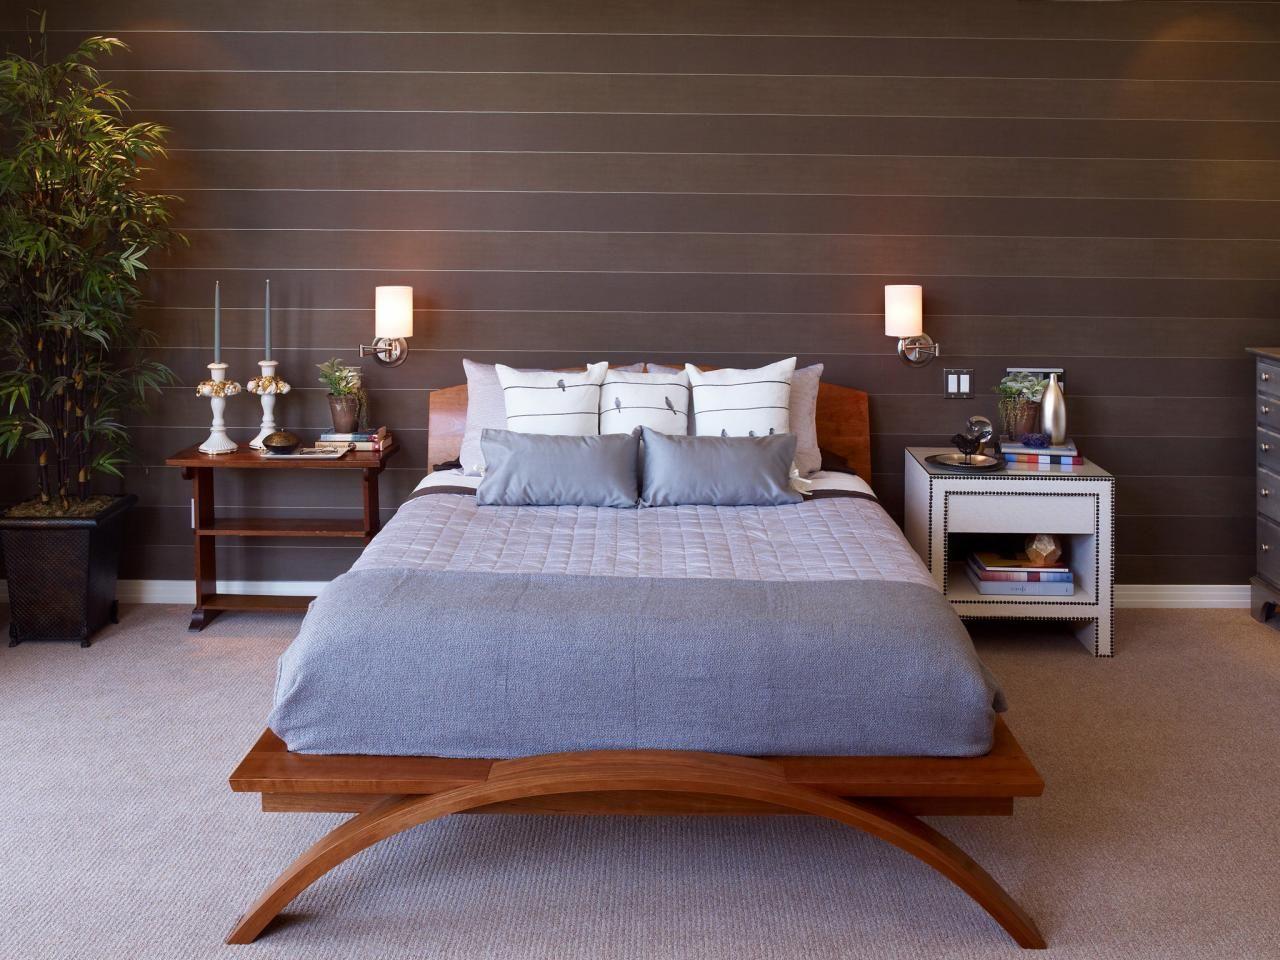 Bedroom wall light fixtures - Bedroom Wall Lights Teatro Ristrutturazione Della Casa E Illusioni Bedroom Wall Designs For Girls